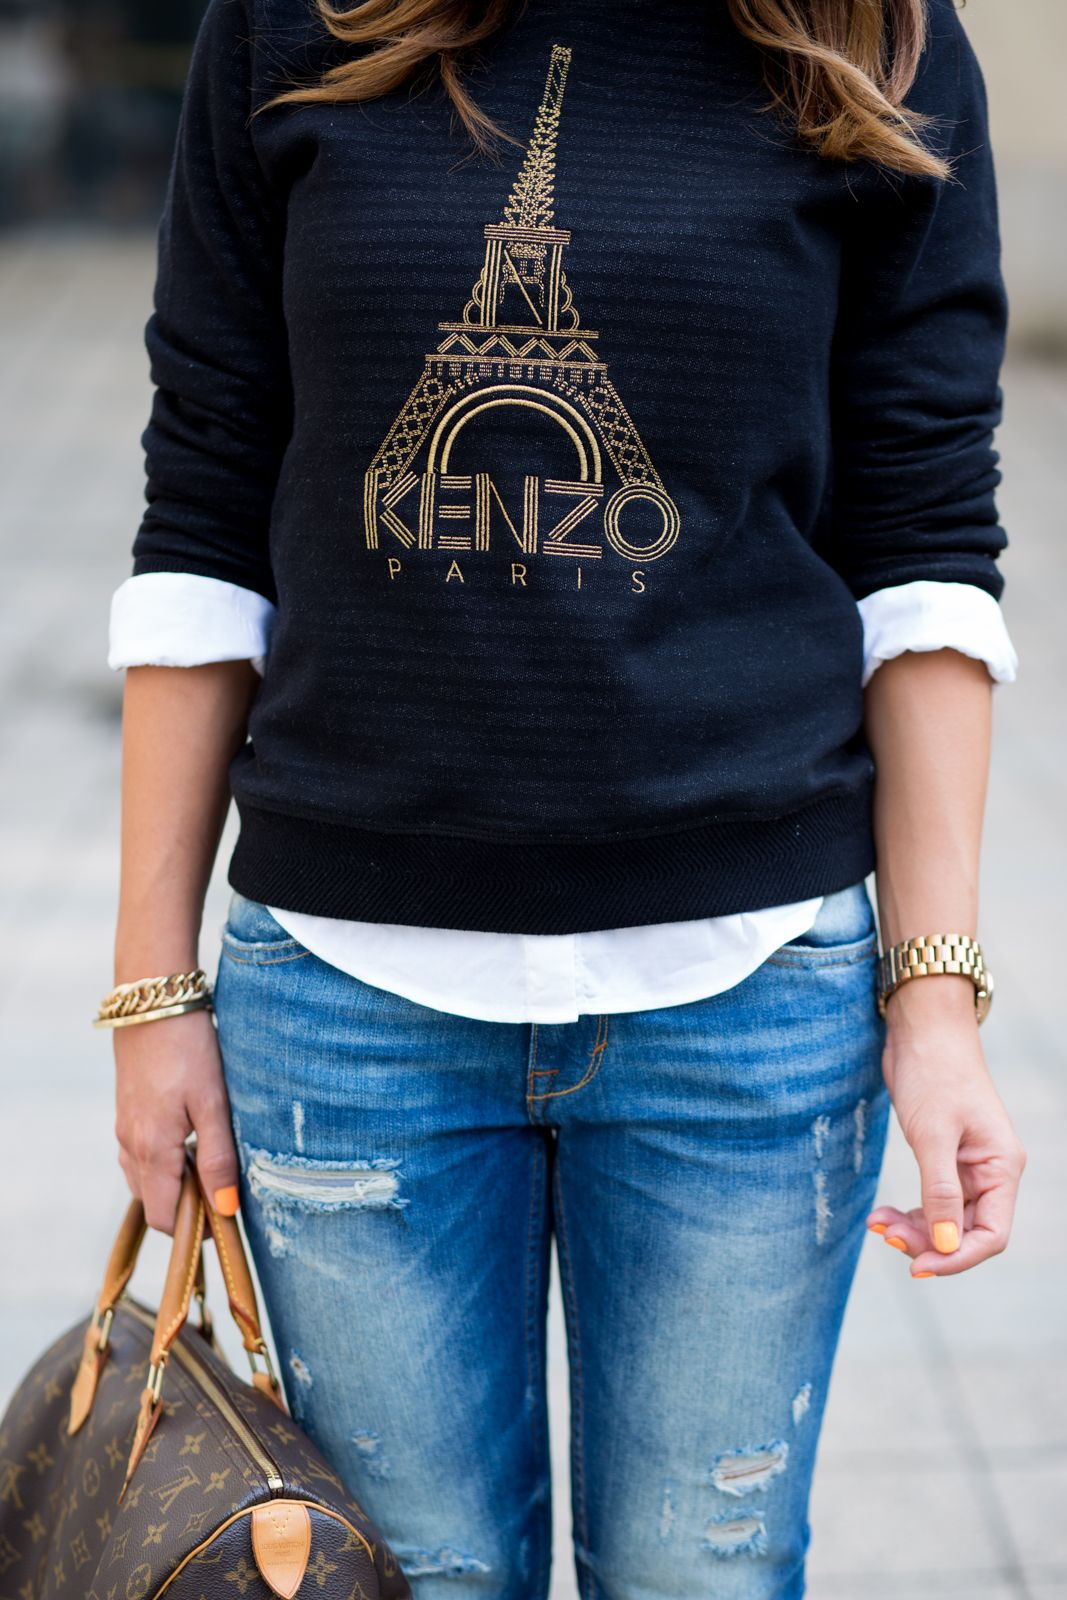 3a3da8f3 Kenzo navy blue Eiffel tower print jersey over white shirt + jeans and  Louis Vuitton handbag